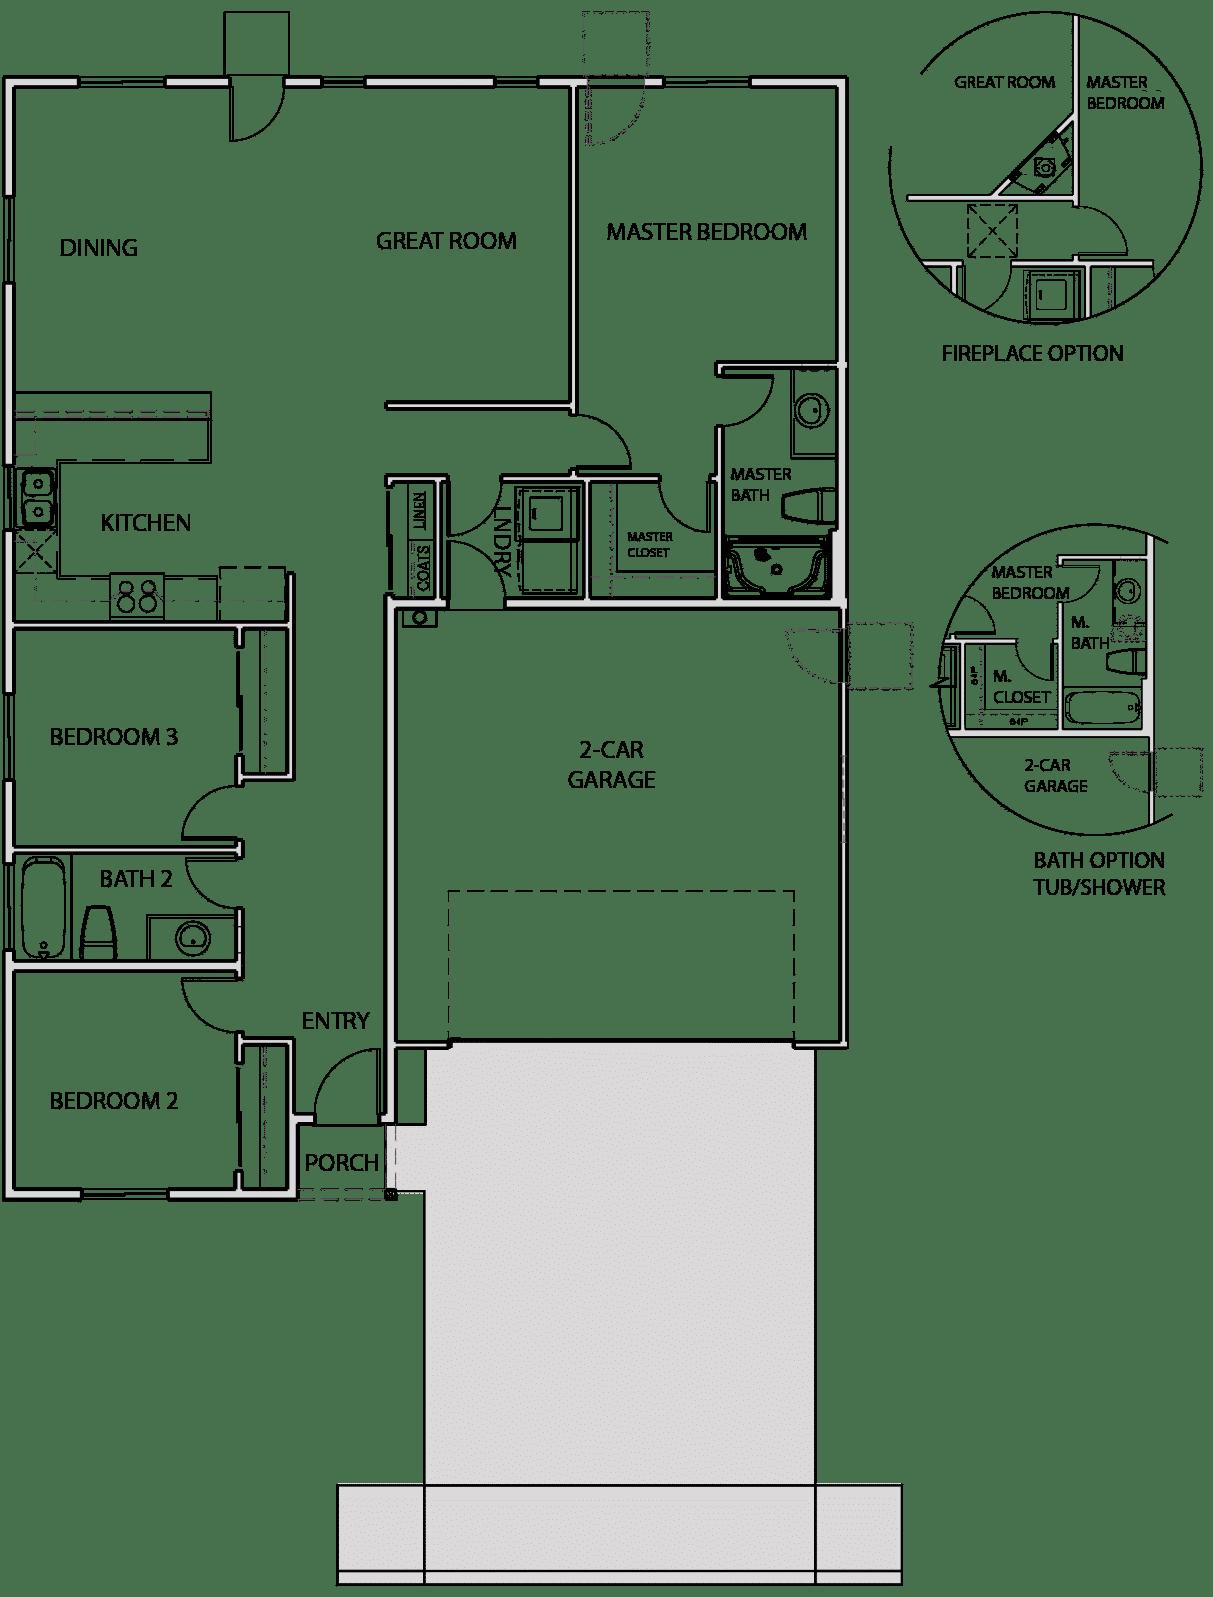 2019-12-23-nv-flats-plan-5-1441-floorplan-options